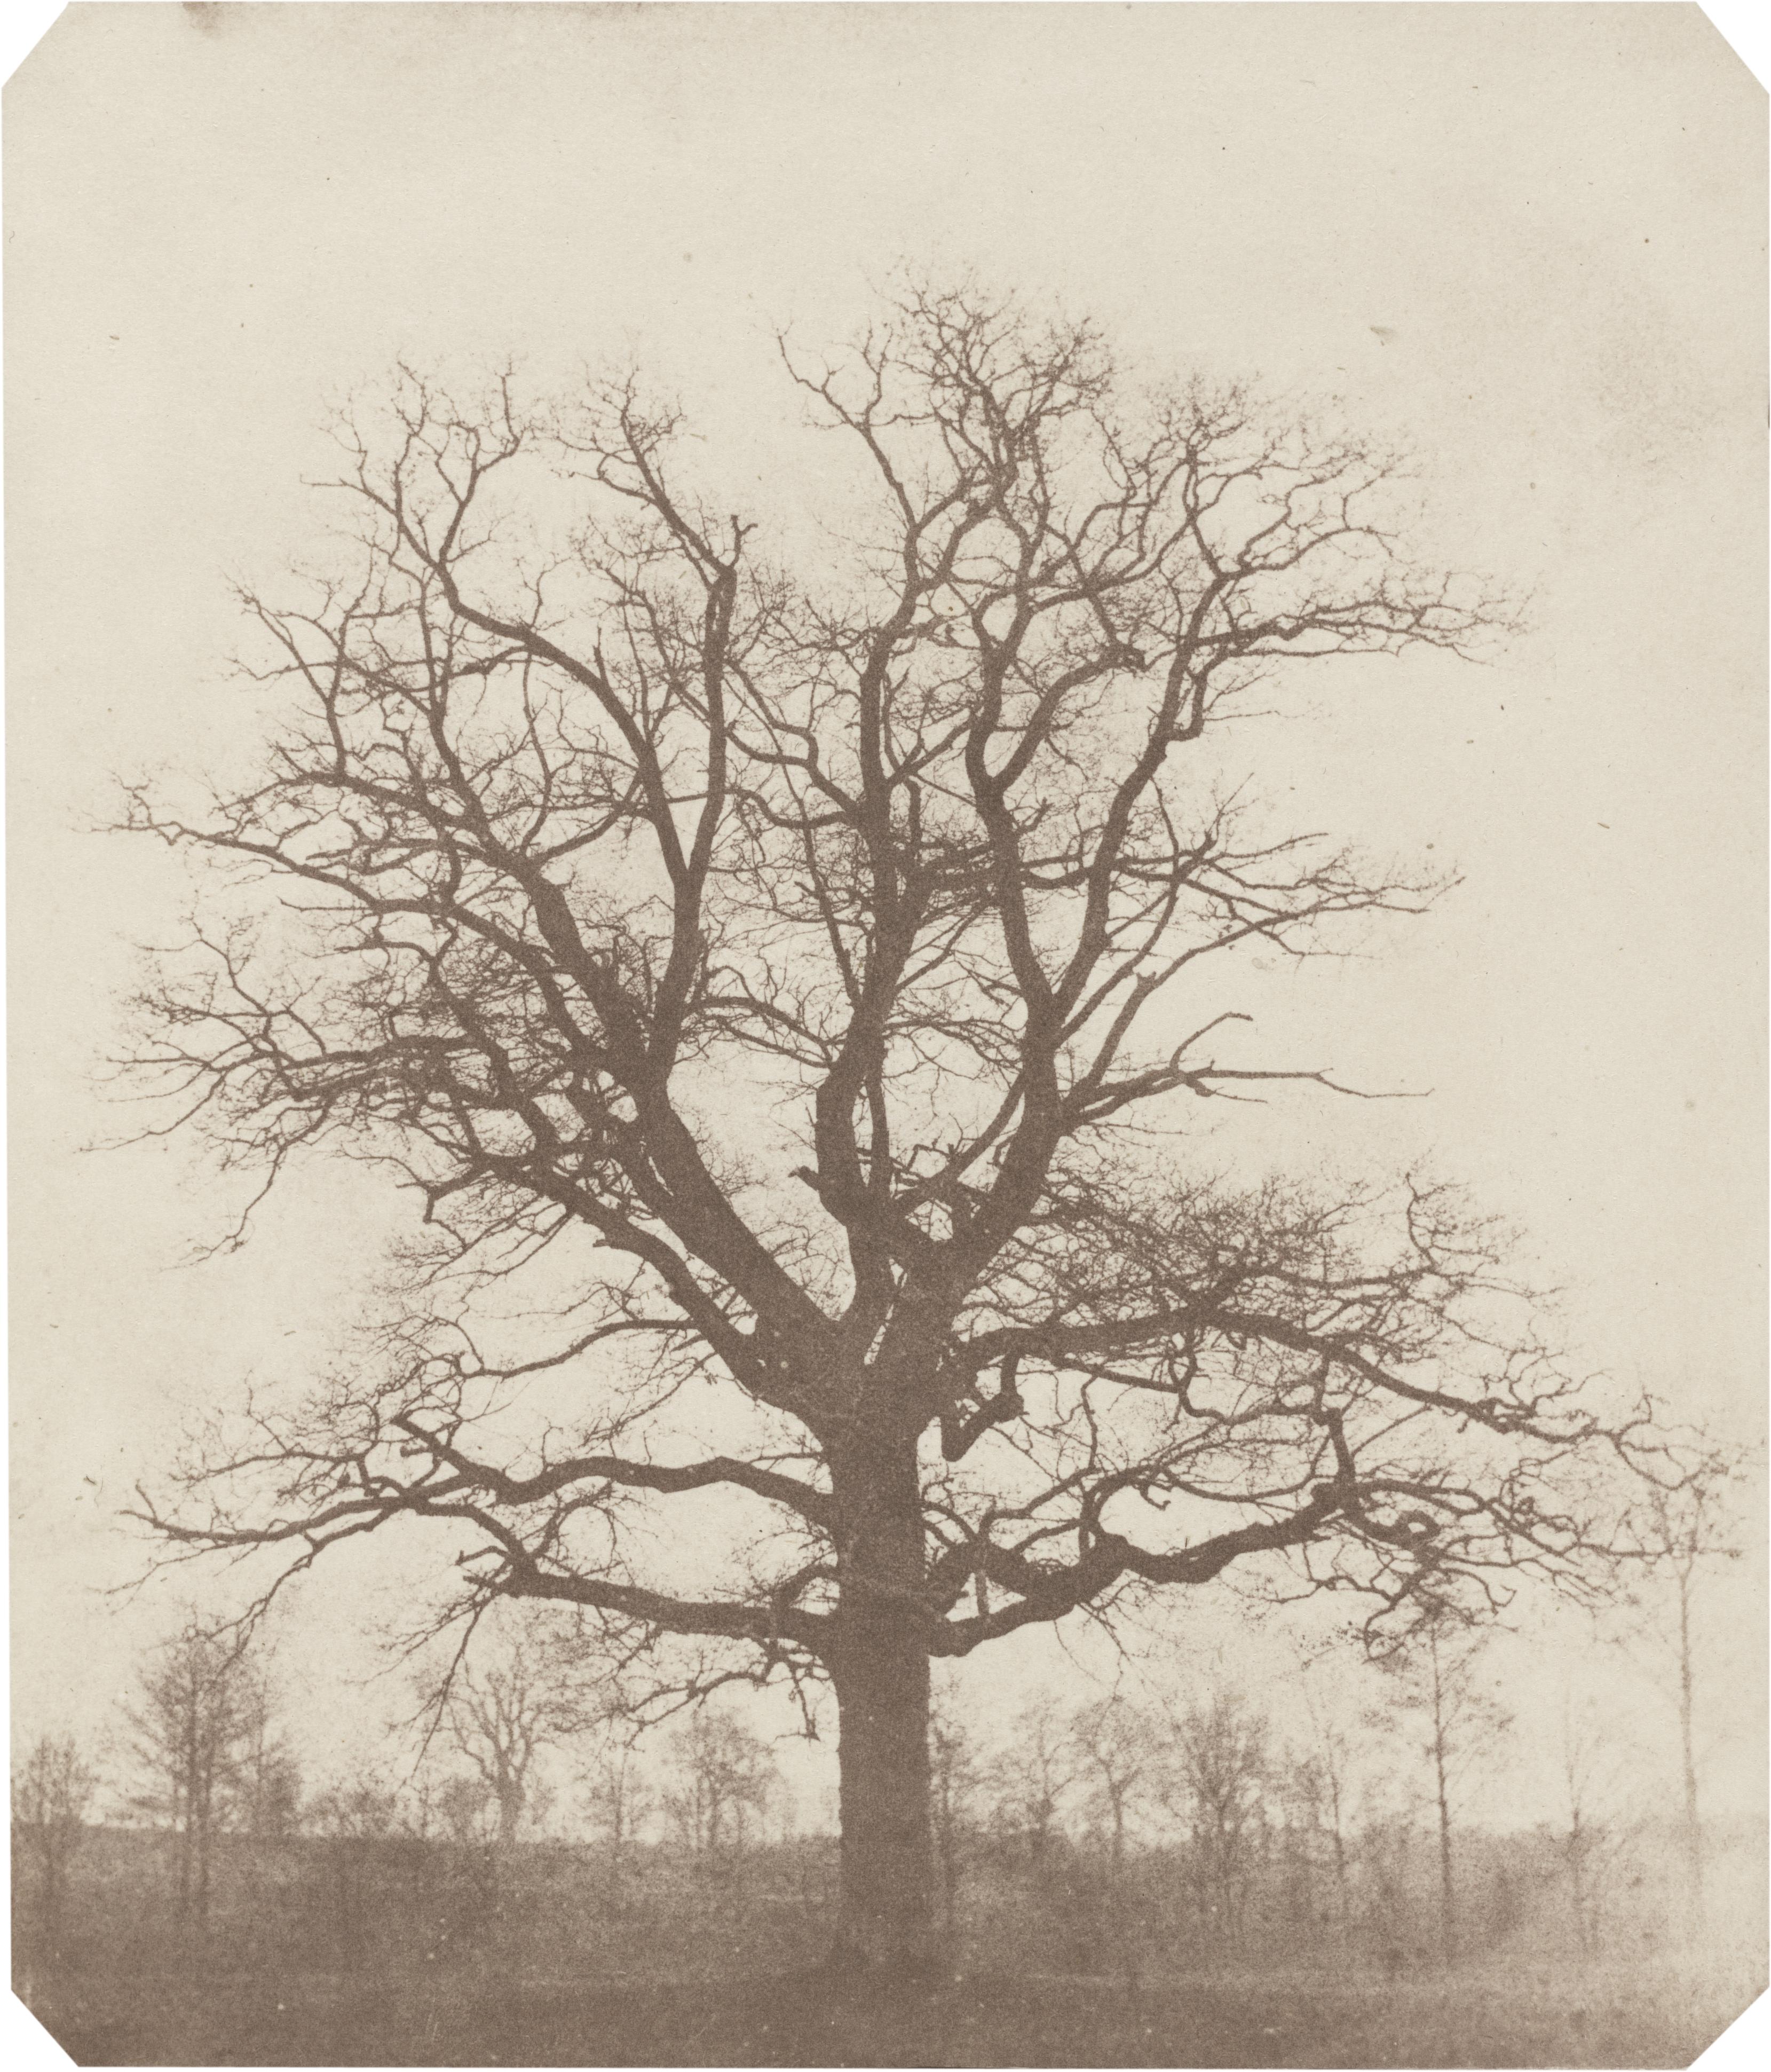 File:William Henry Fox Talbot, Oak Tree, mid-1840s, NGA 92227.jpg